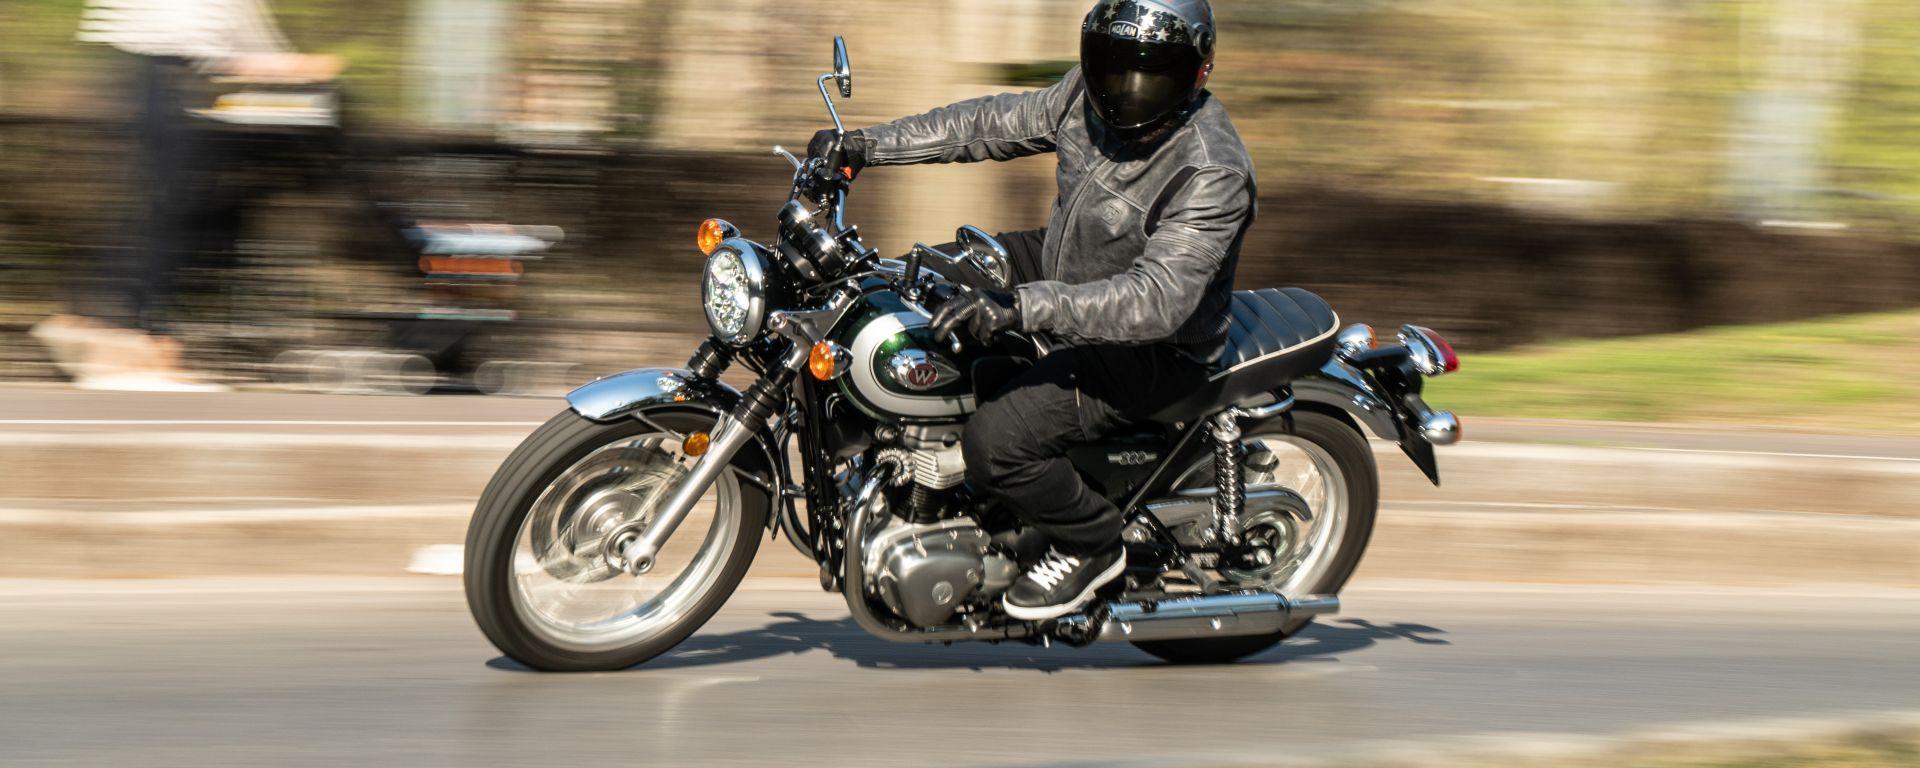 Kawasaki W 800 Classic VIDEO